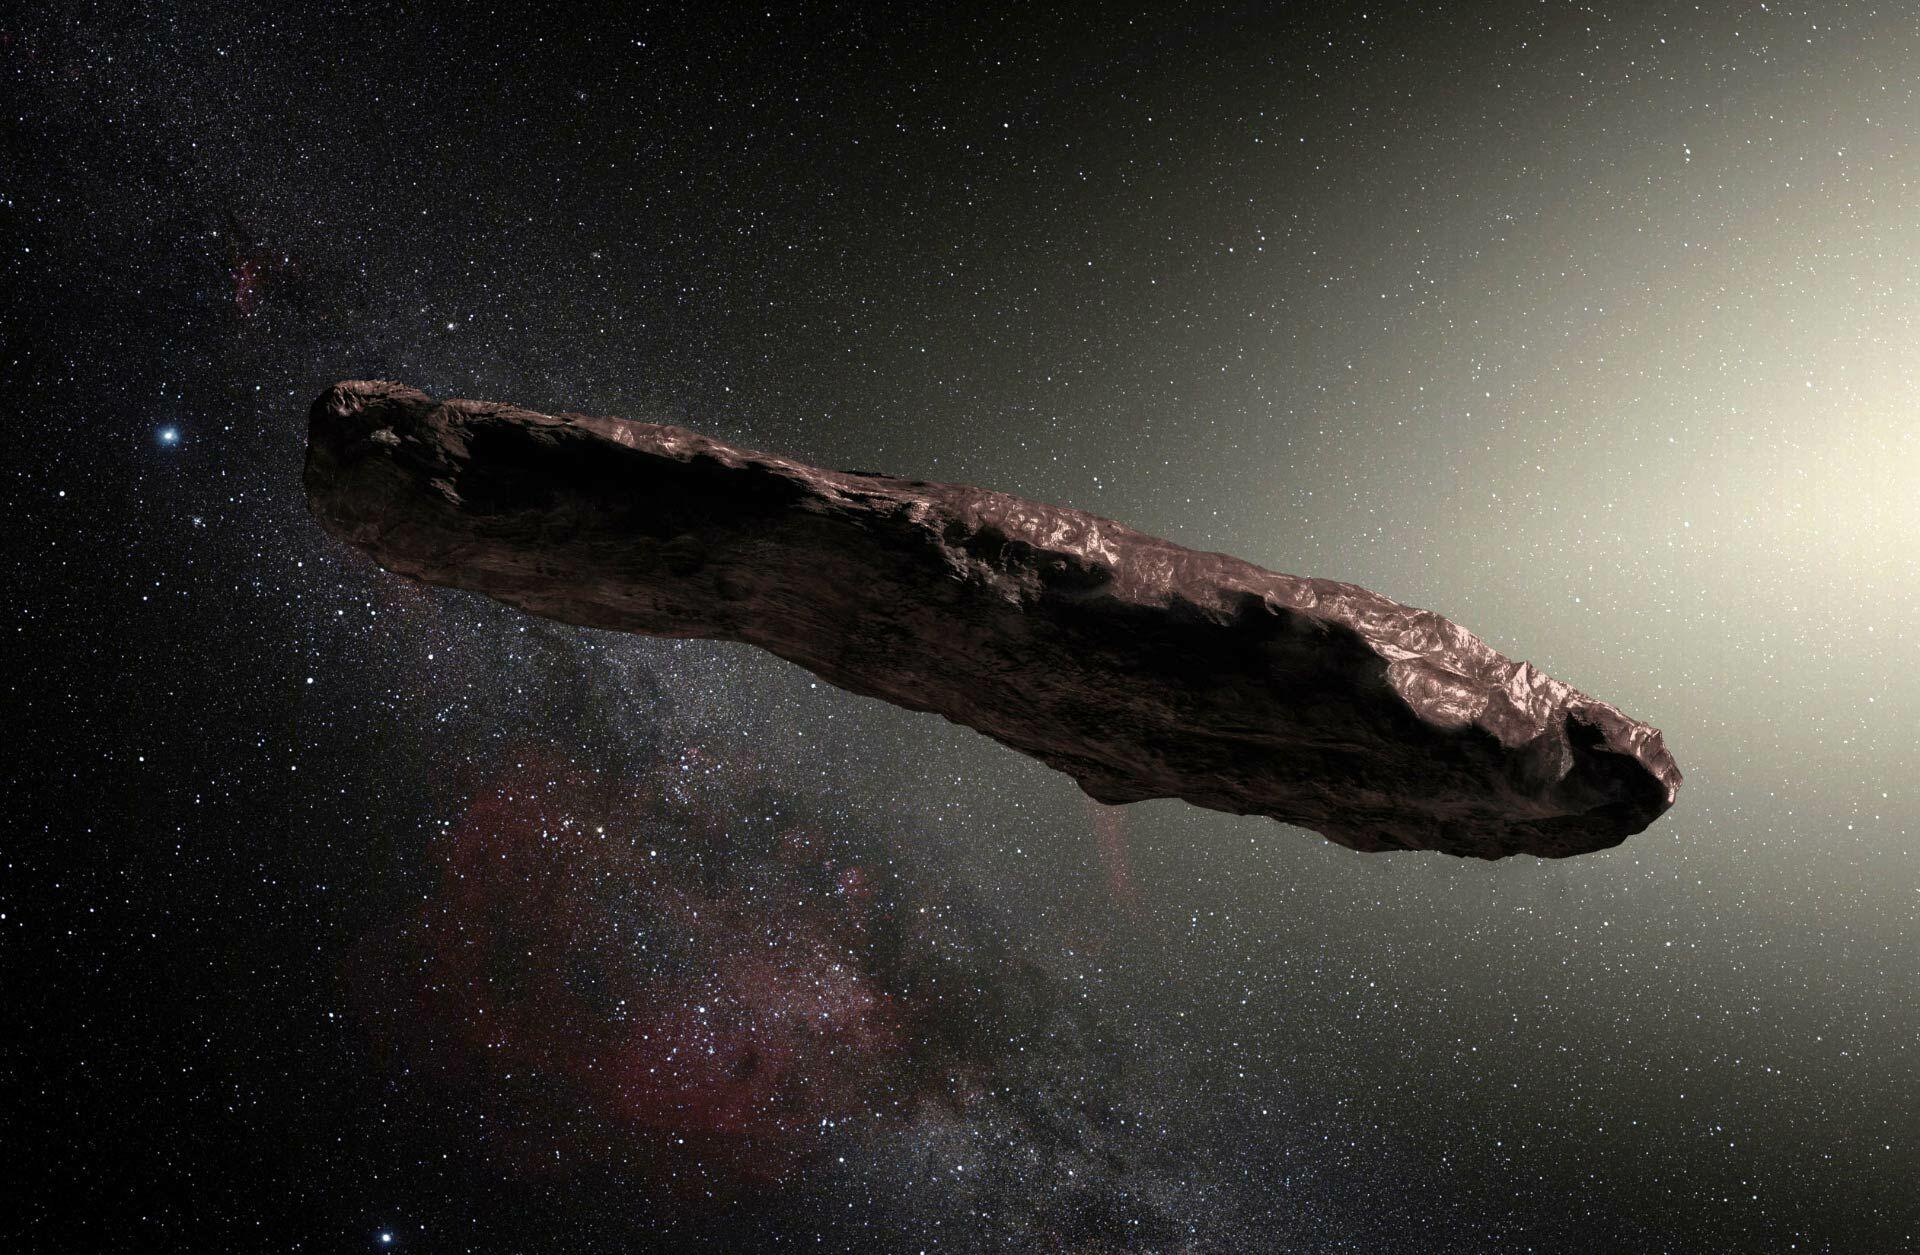 Ilmuwan Harvard Yakin Alien Pernah Berkunjung Ke Bumi Ab197